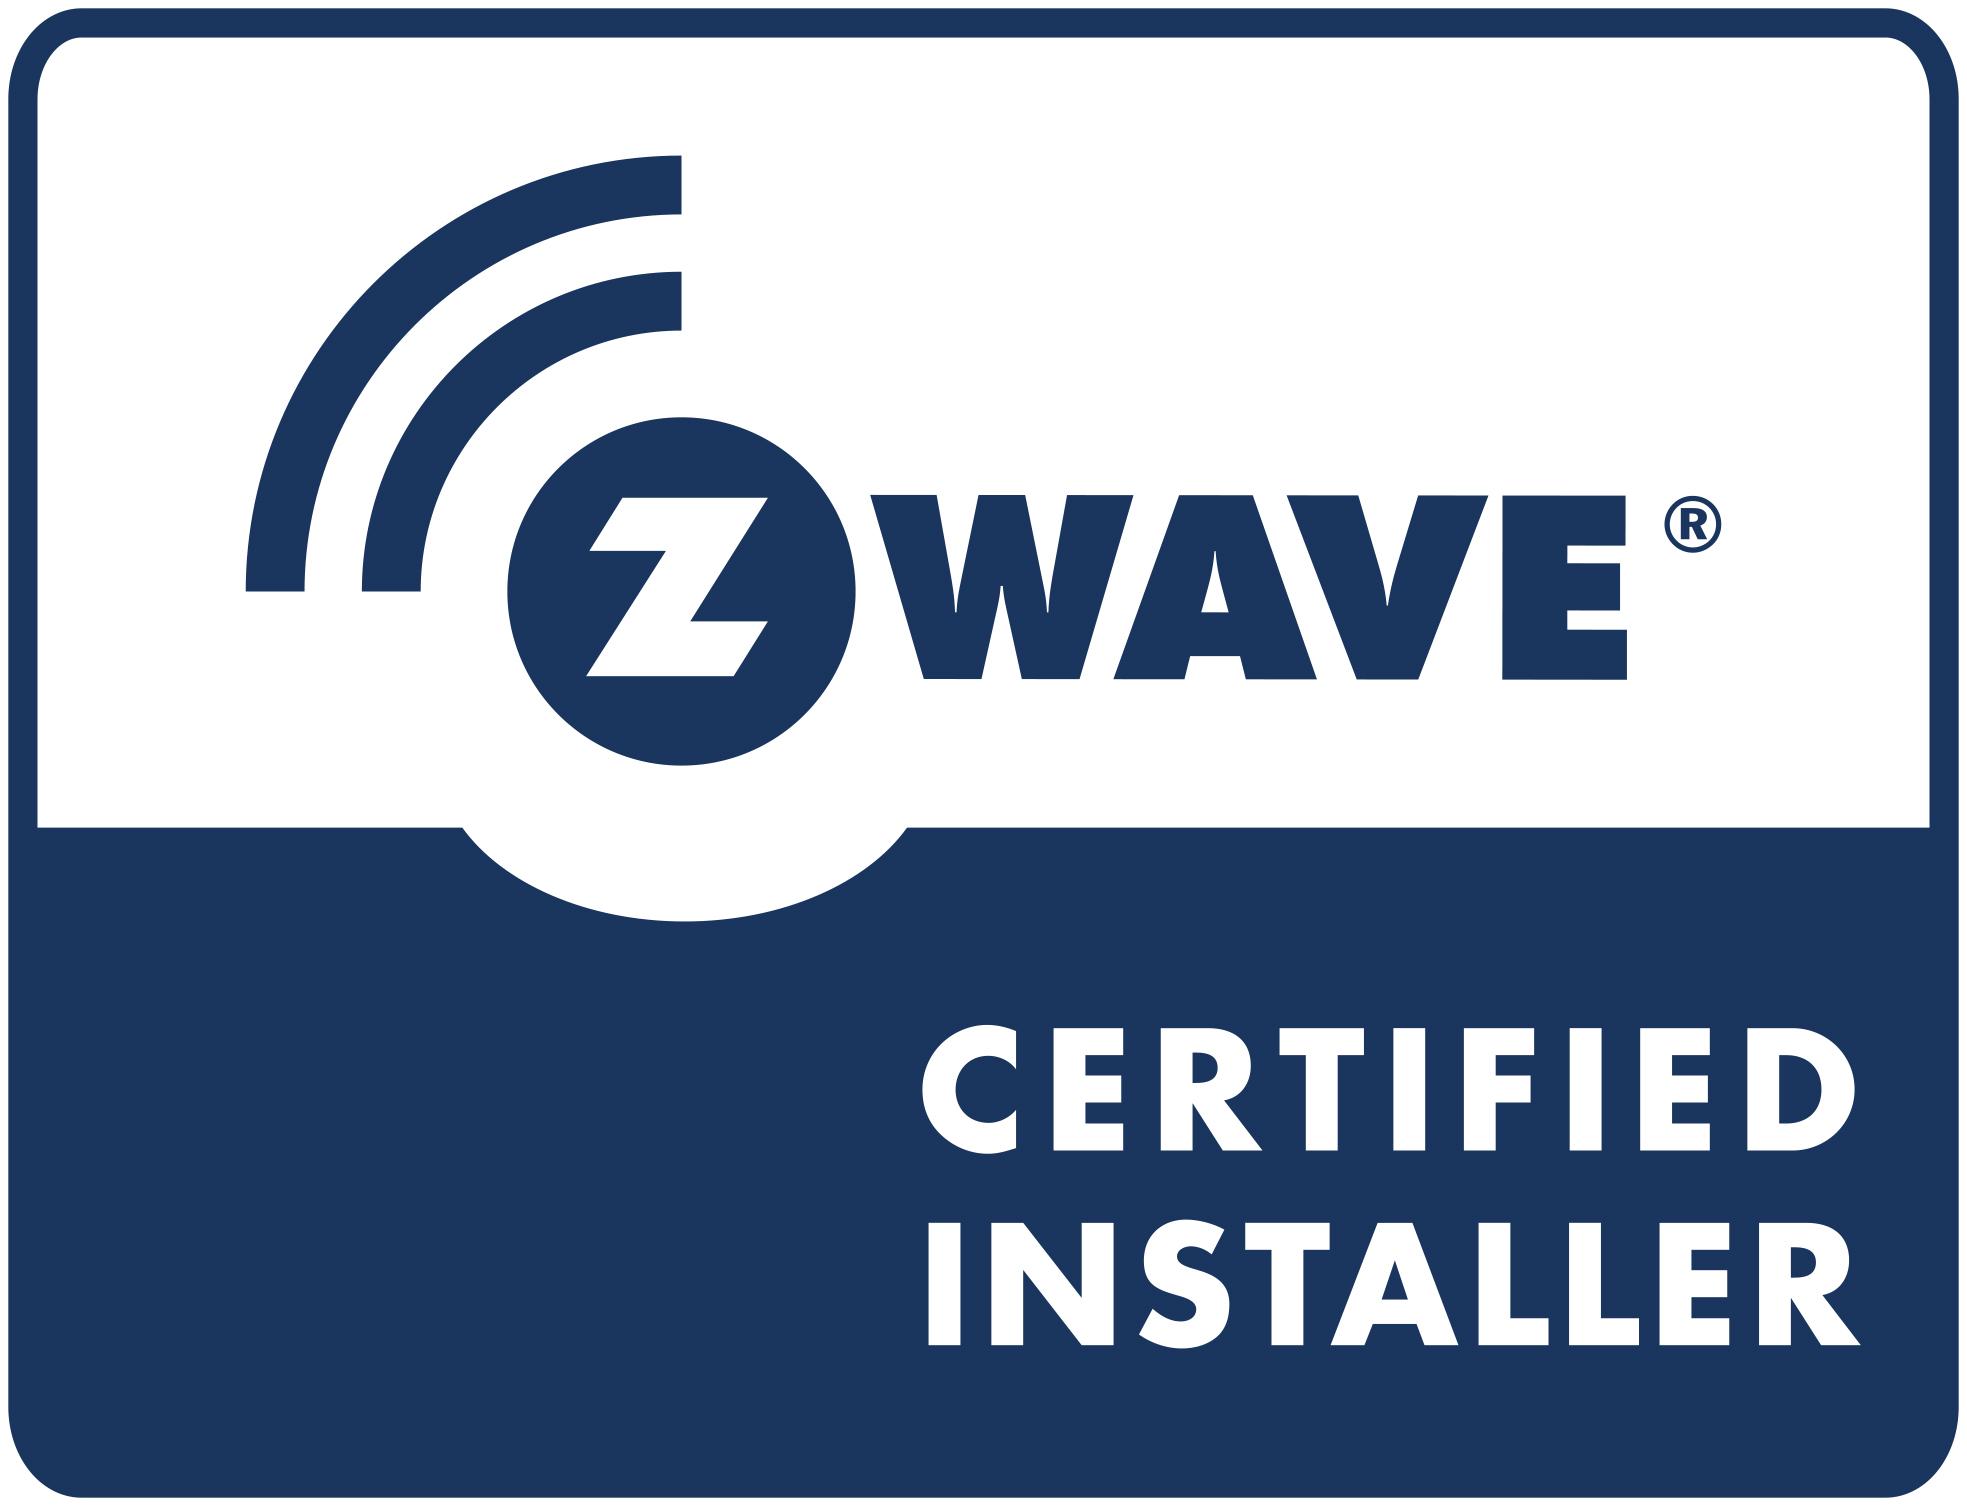 Z-wave Certified Installer